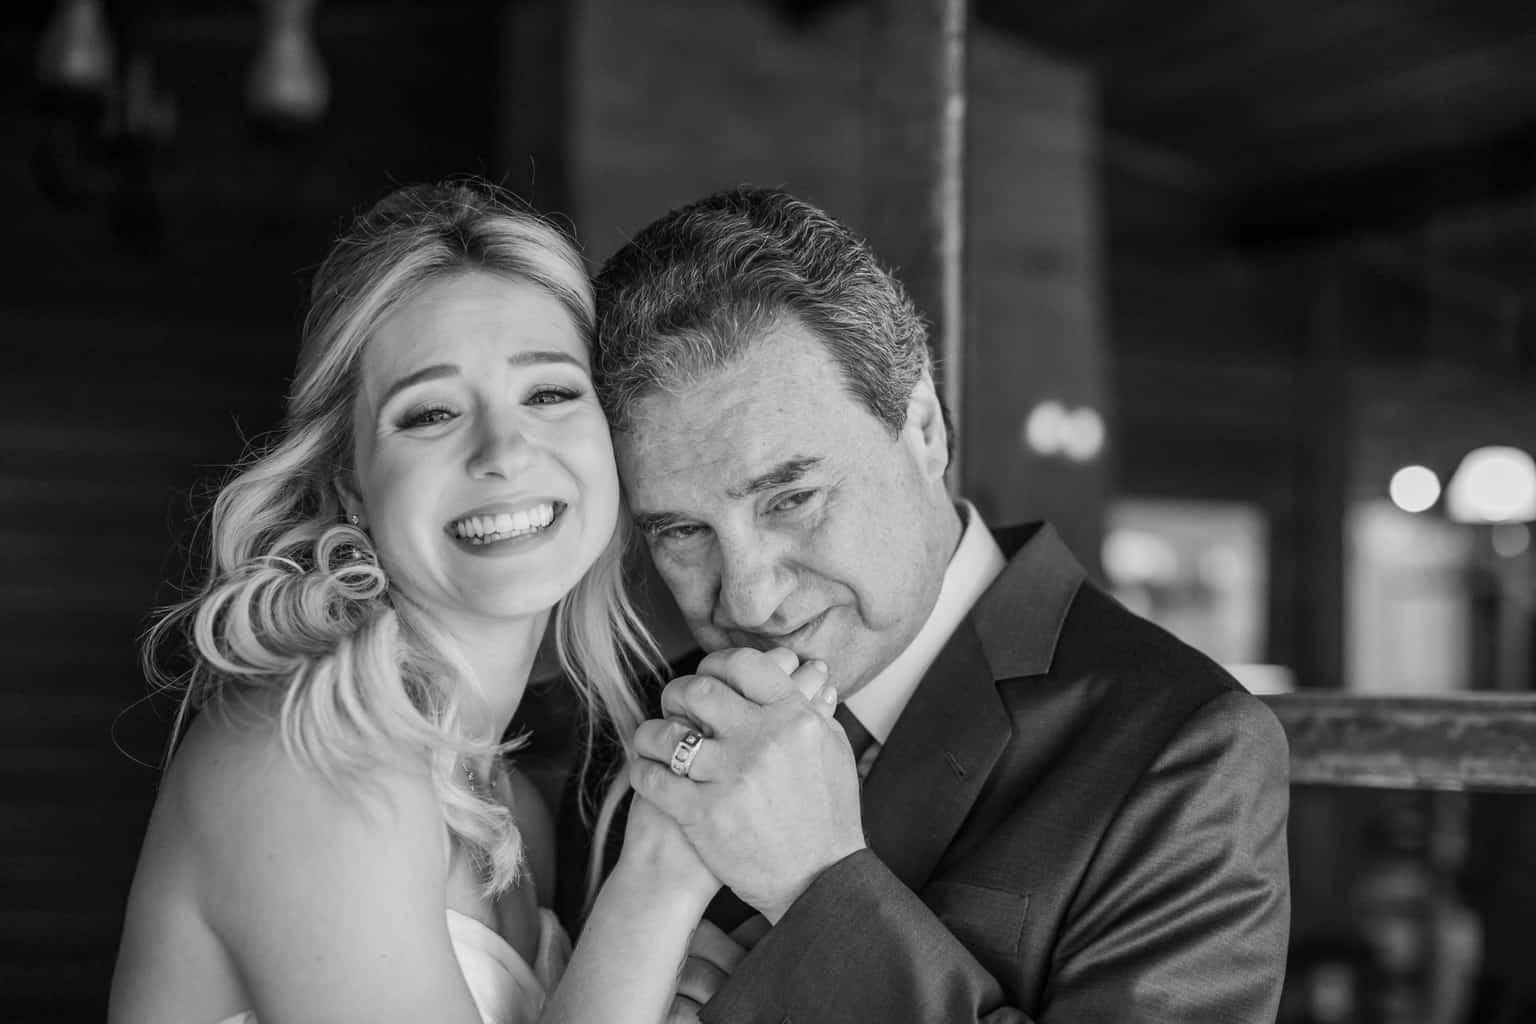 Casamento-Milene-e-Leonardo-decoracao-da-festa-making-of-pai-da-noiva-Roberto-Tamer-terras-claras112